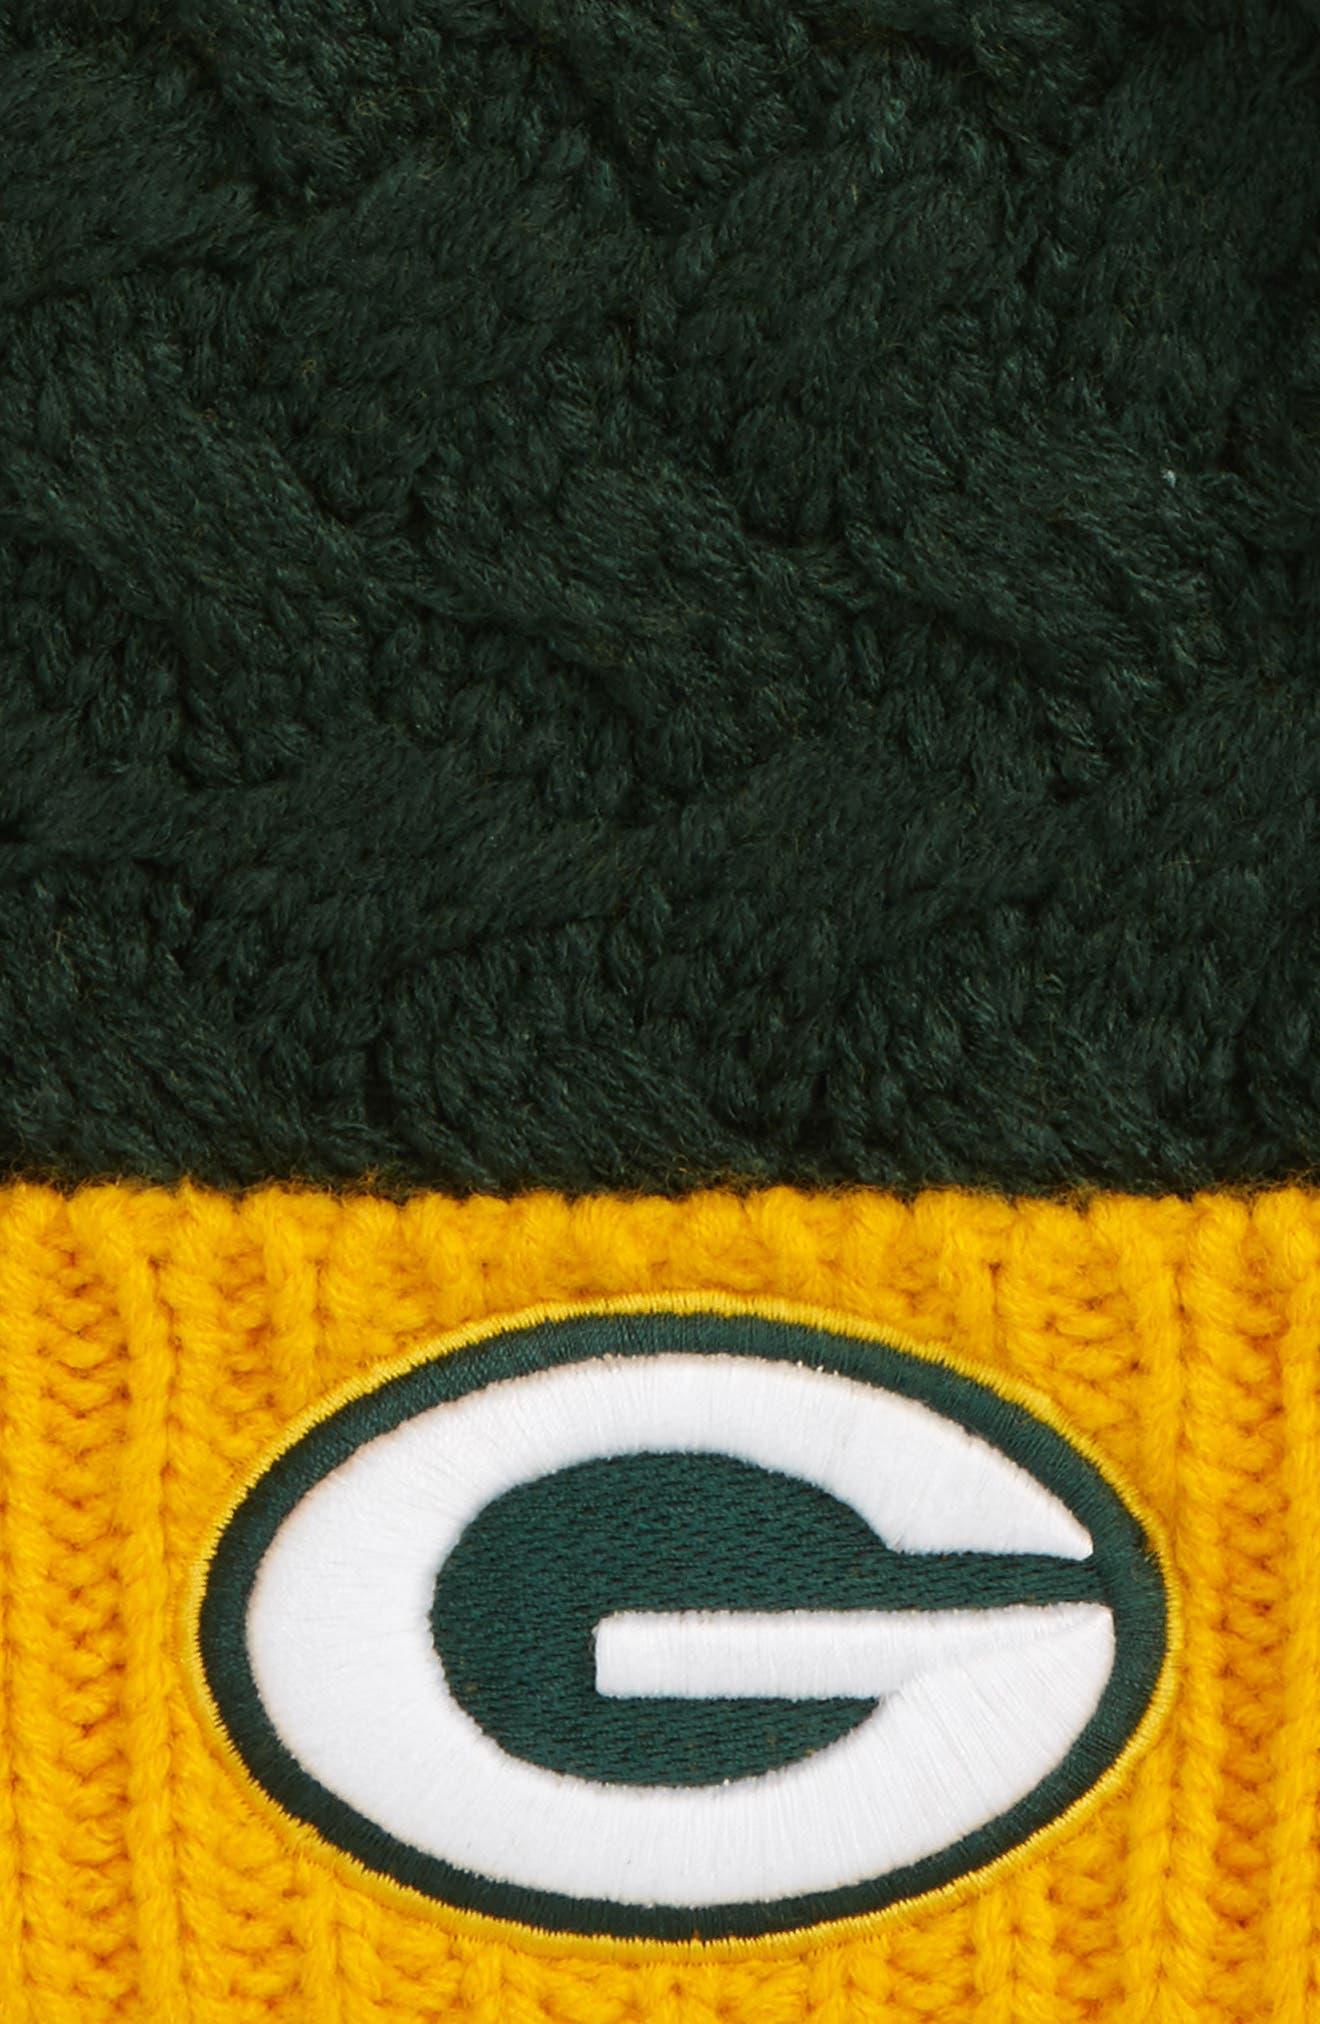 Matterhorn Green Bay Packers Pom Beanie,                             Alternate thumbnail 2, color,                             Dark Green